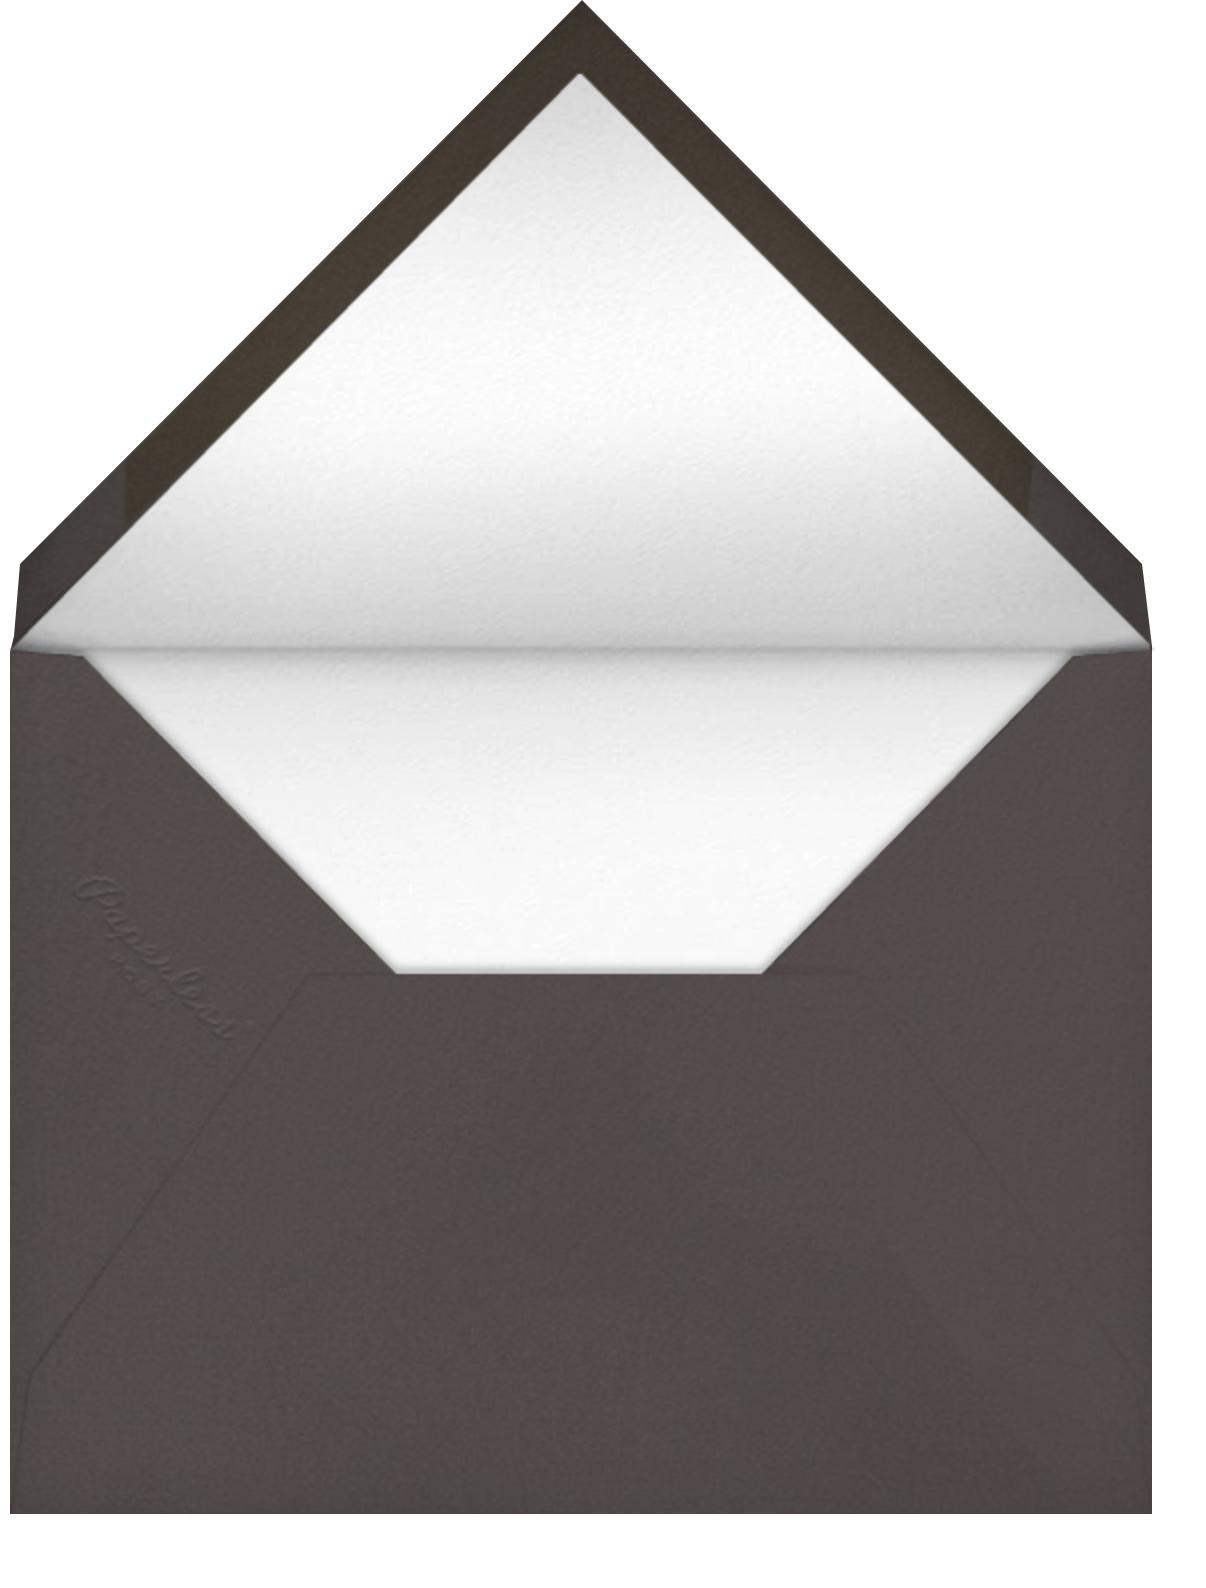 Kitty Hawk Greetings - Ash - Paperless Post - null - envelope back